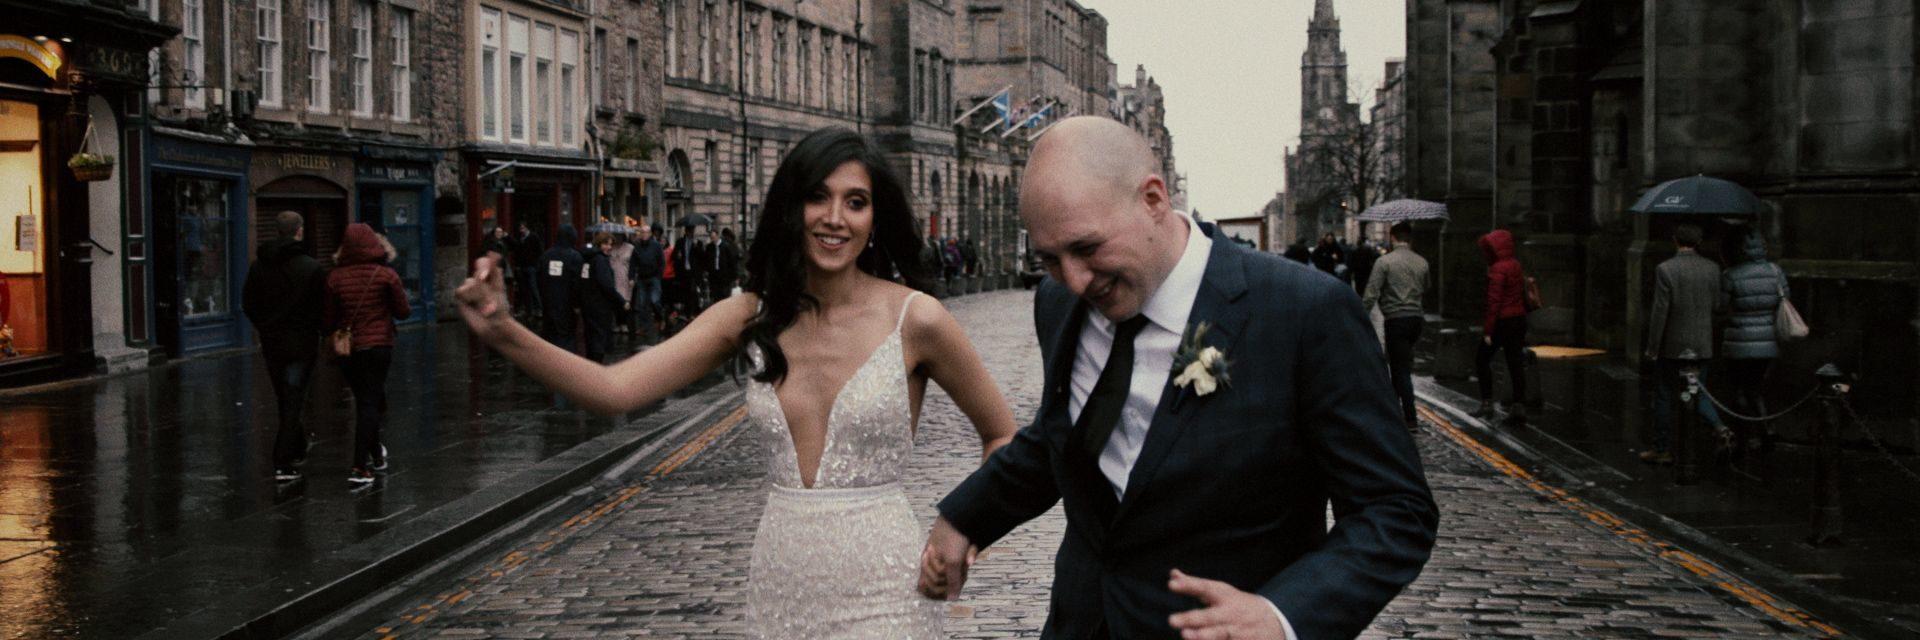 lisbon-wedding-videographer-cinemate-films-04